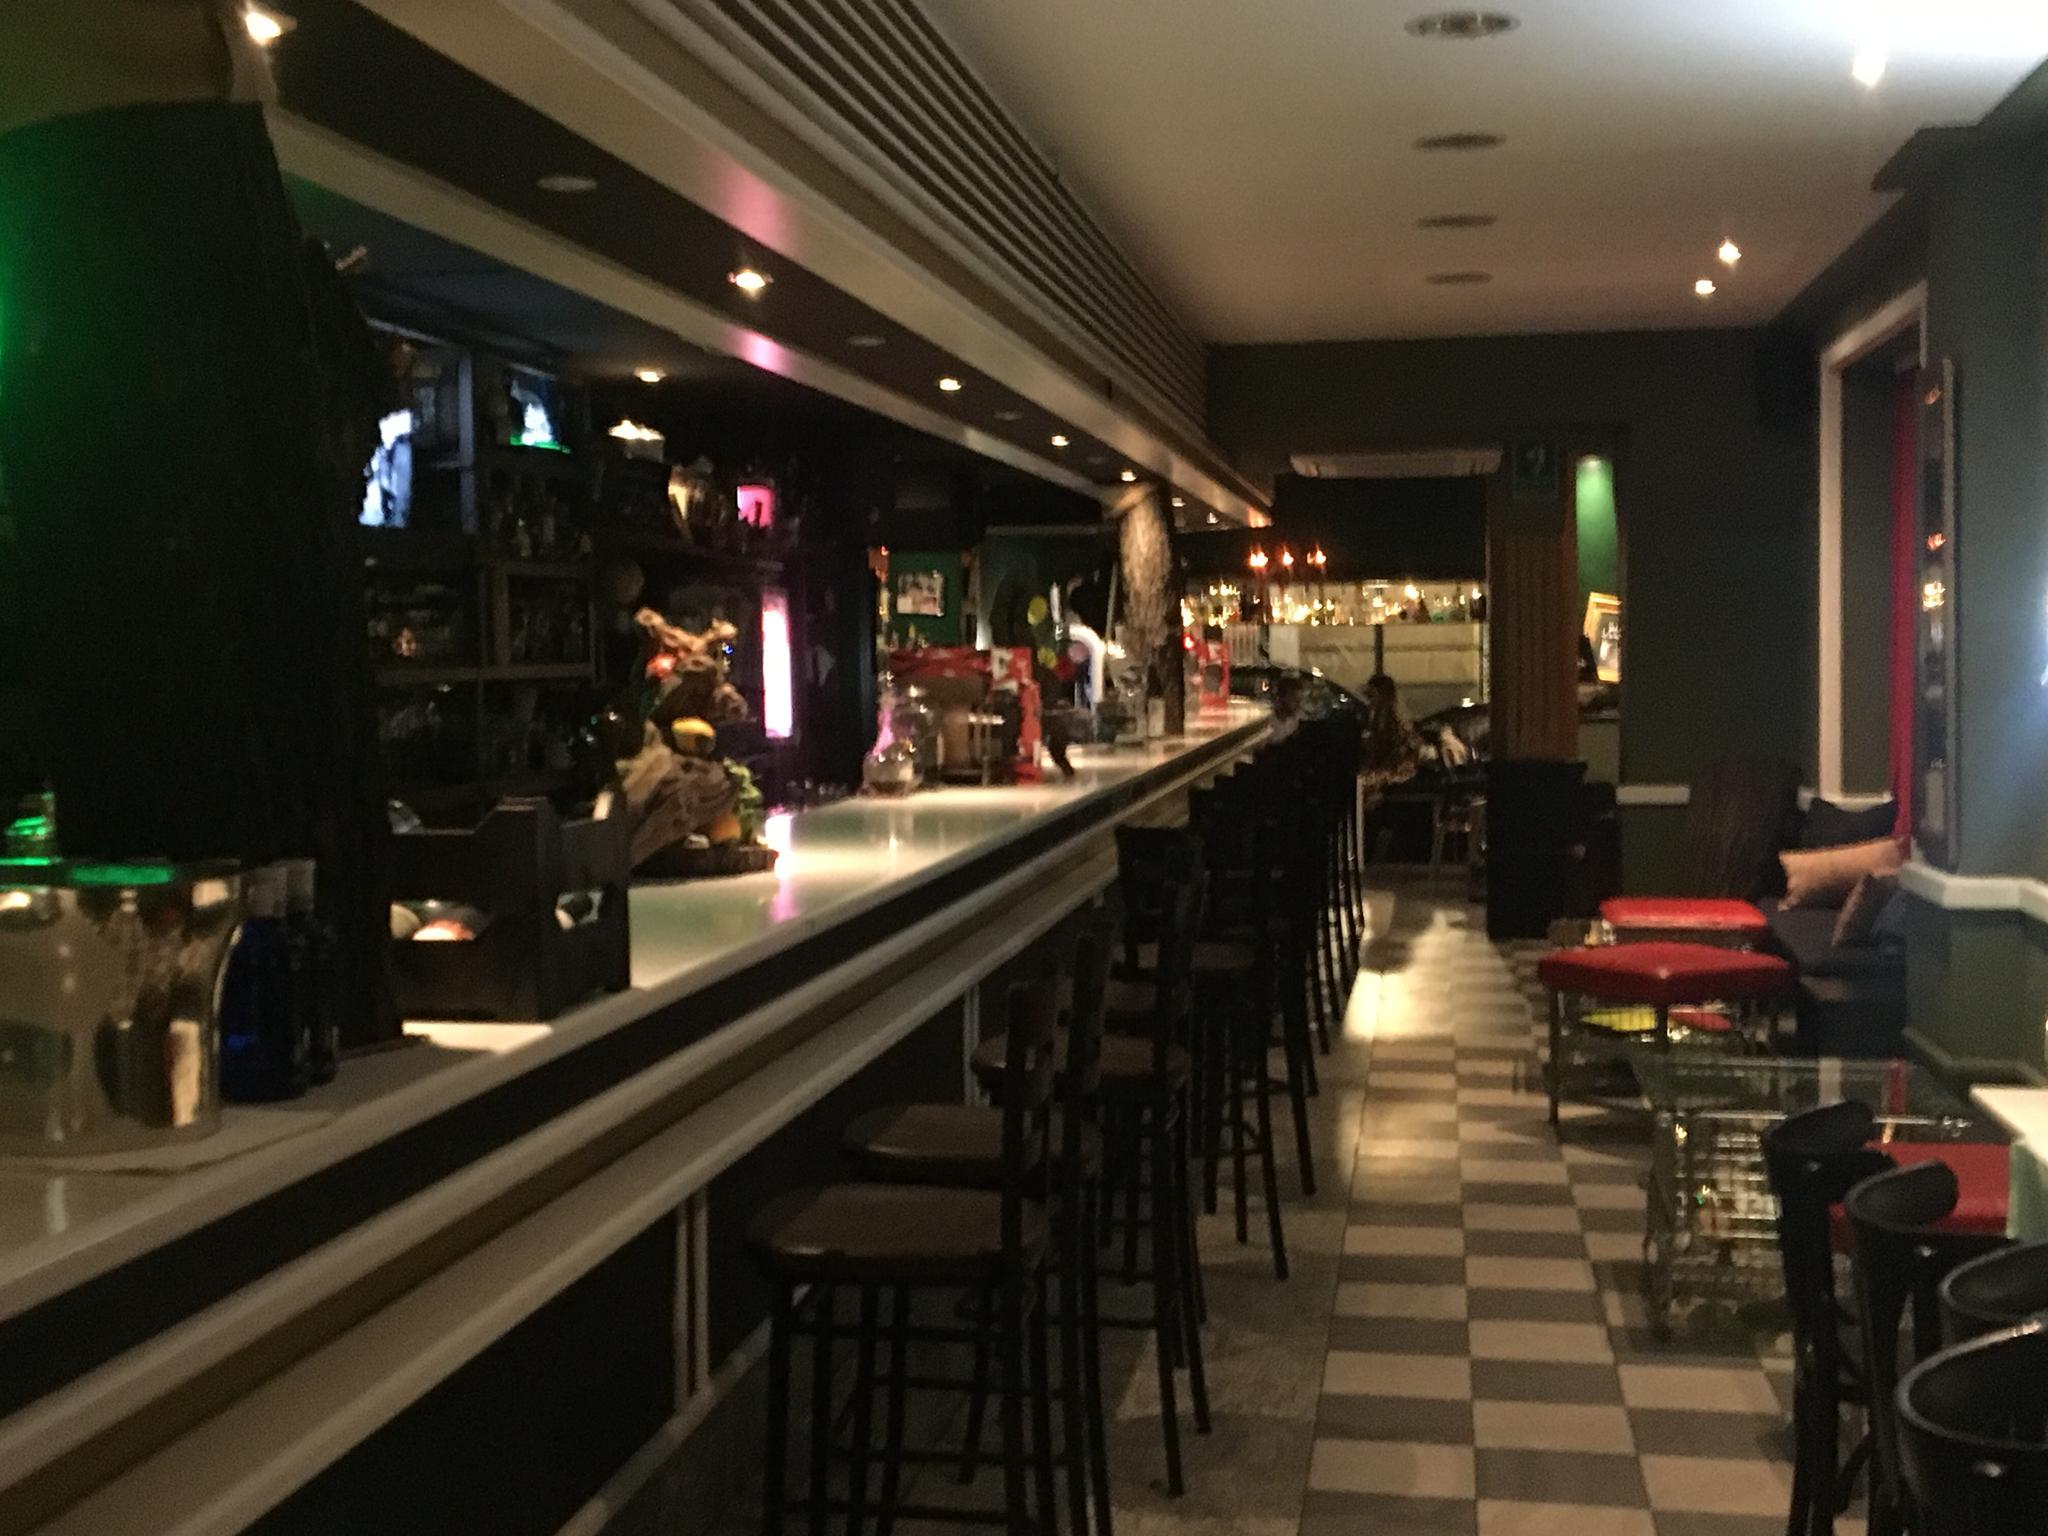 (Español) Moncloa – Se traspasa Bar/Restaurante de 240 m2